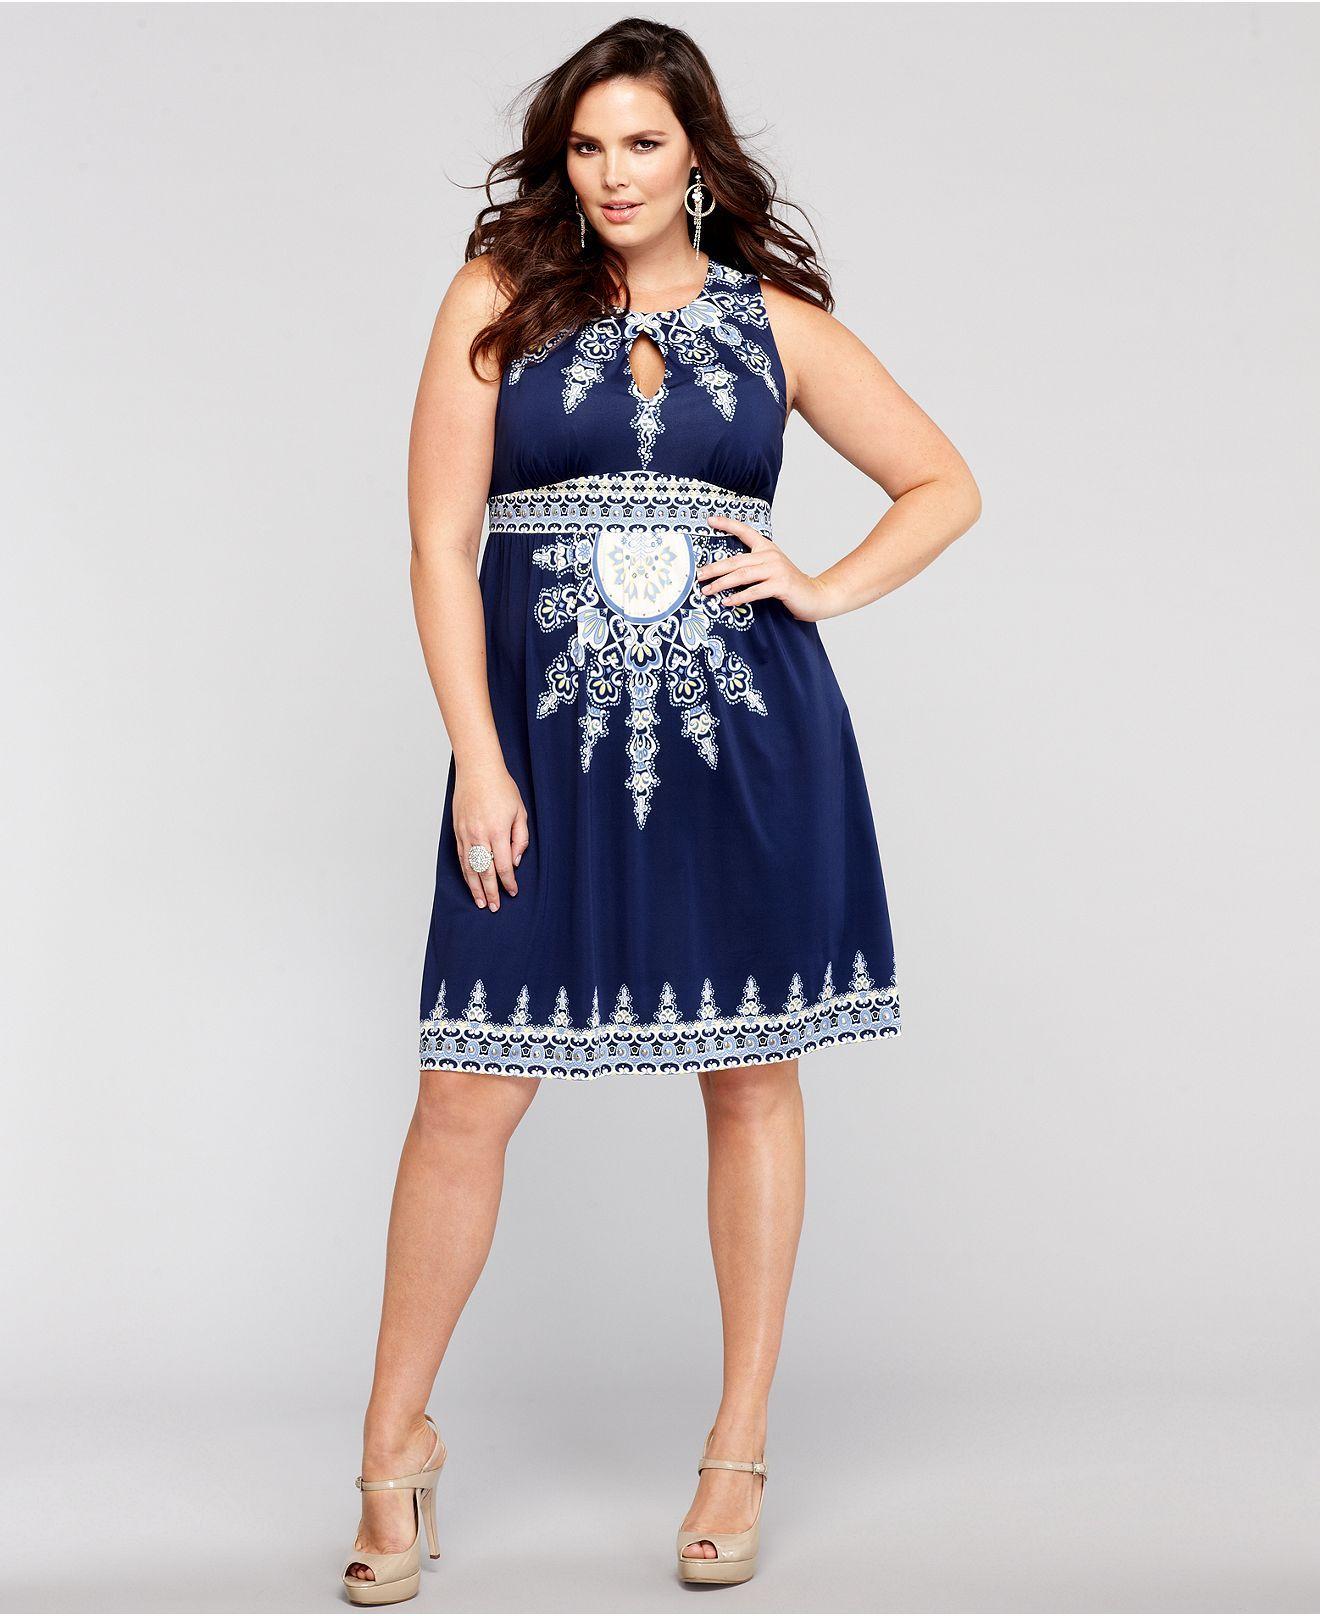 INC International Concepts Plus Size Dress, Sleeveless ...